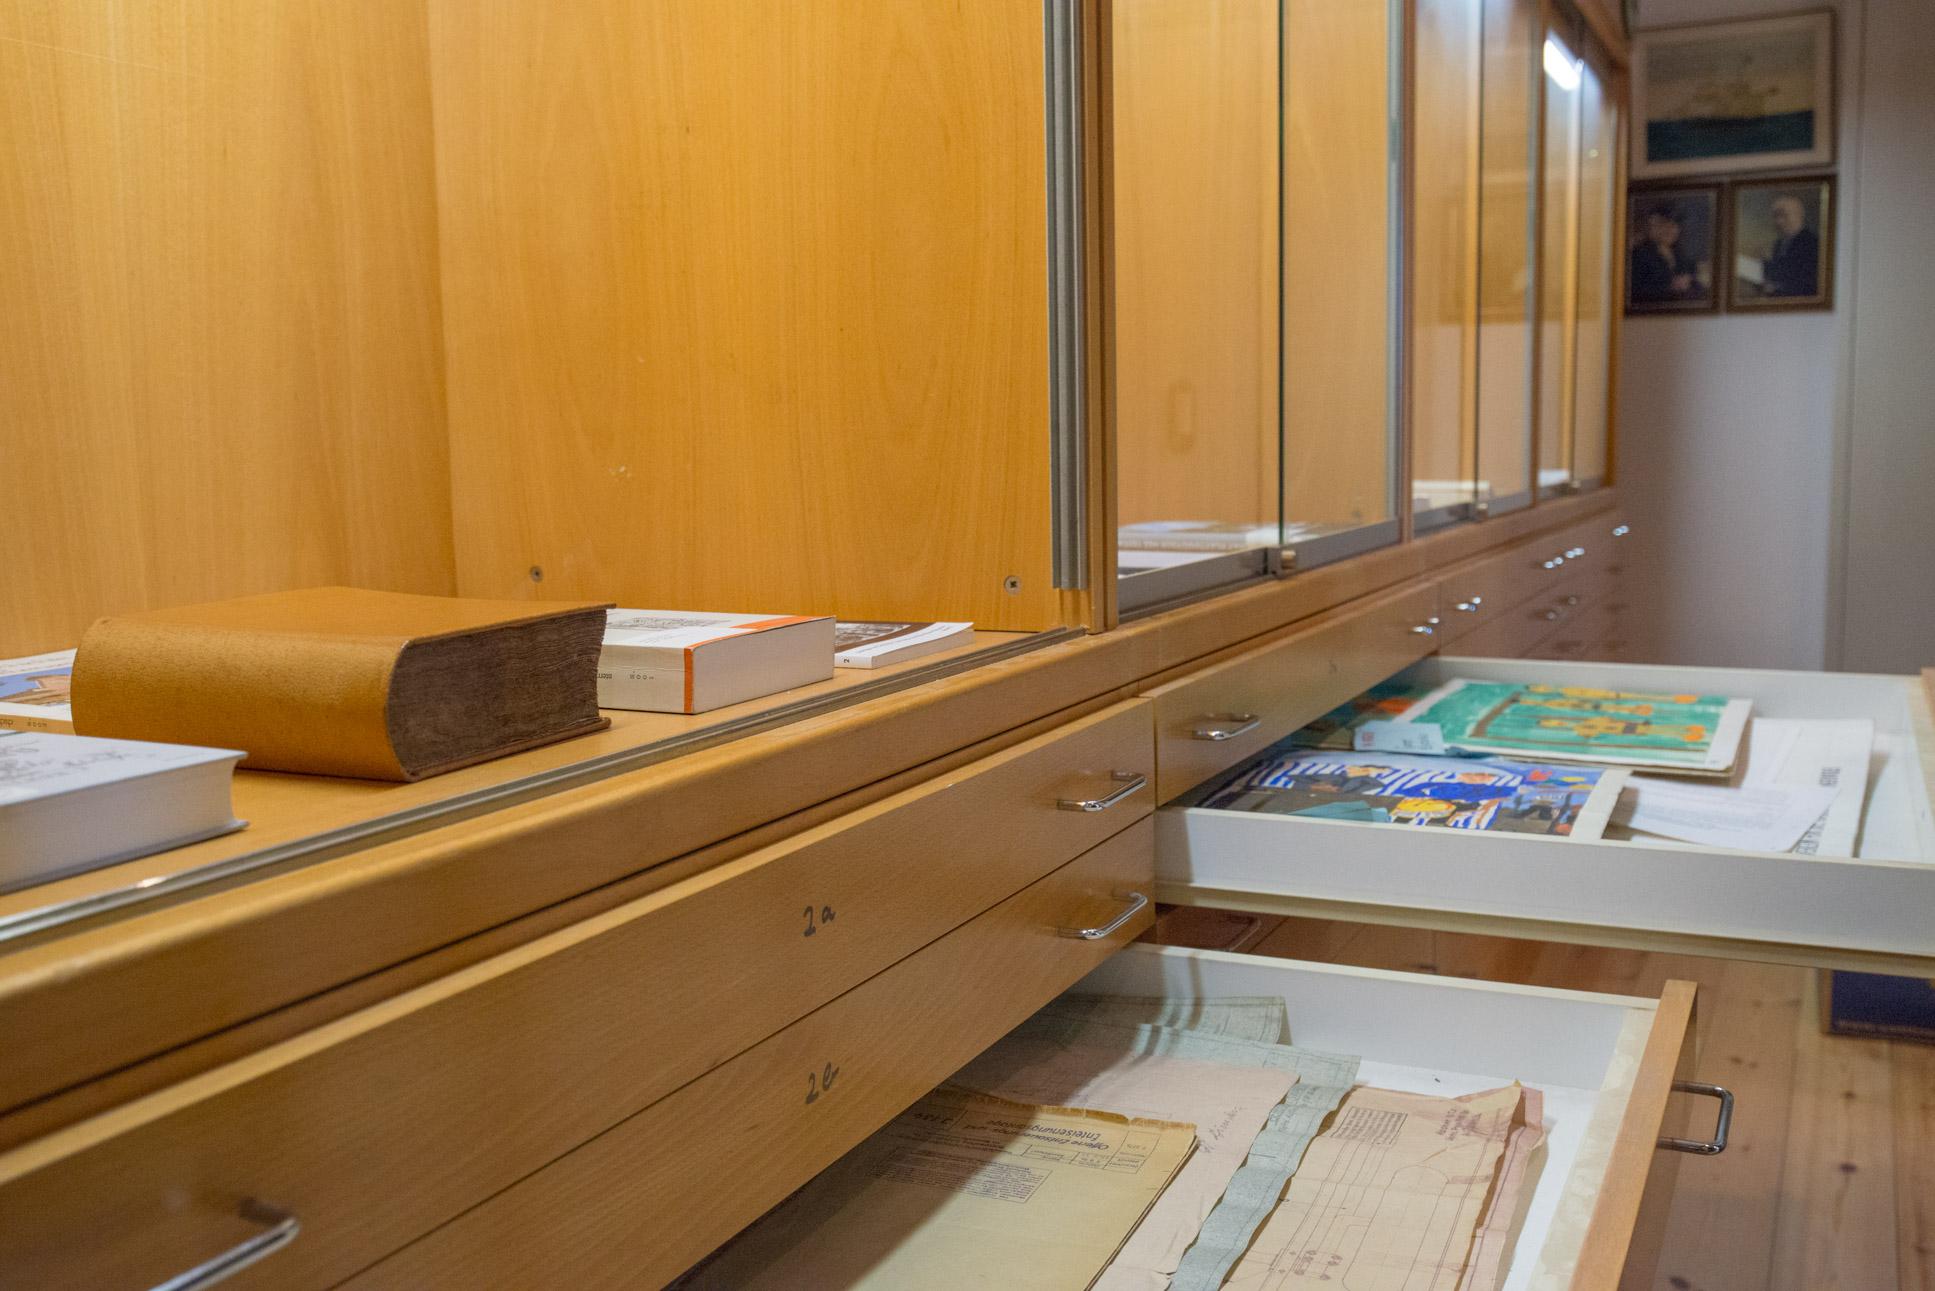 Handwerksmuseum-Horneburg-Rundgang2018-2830-12